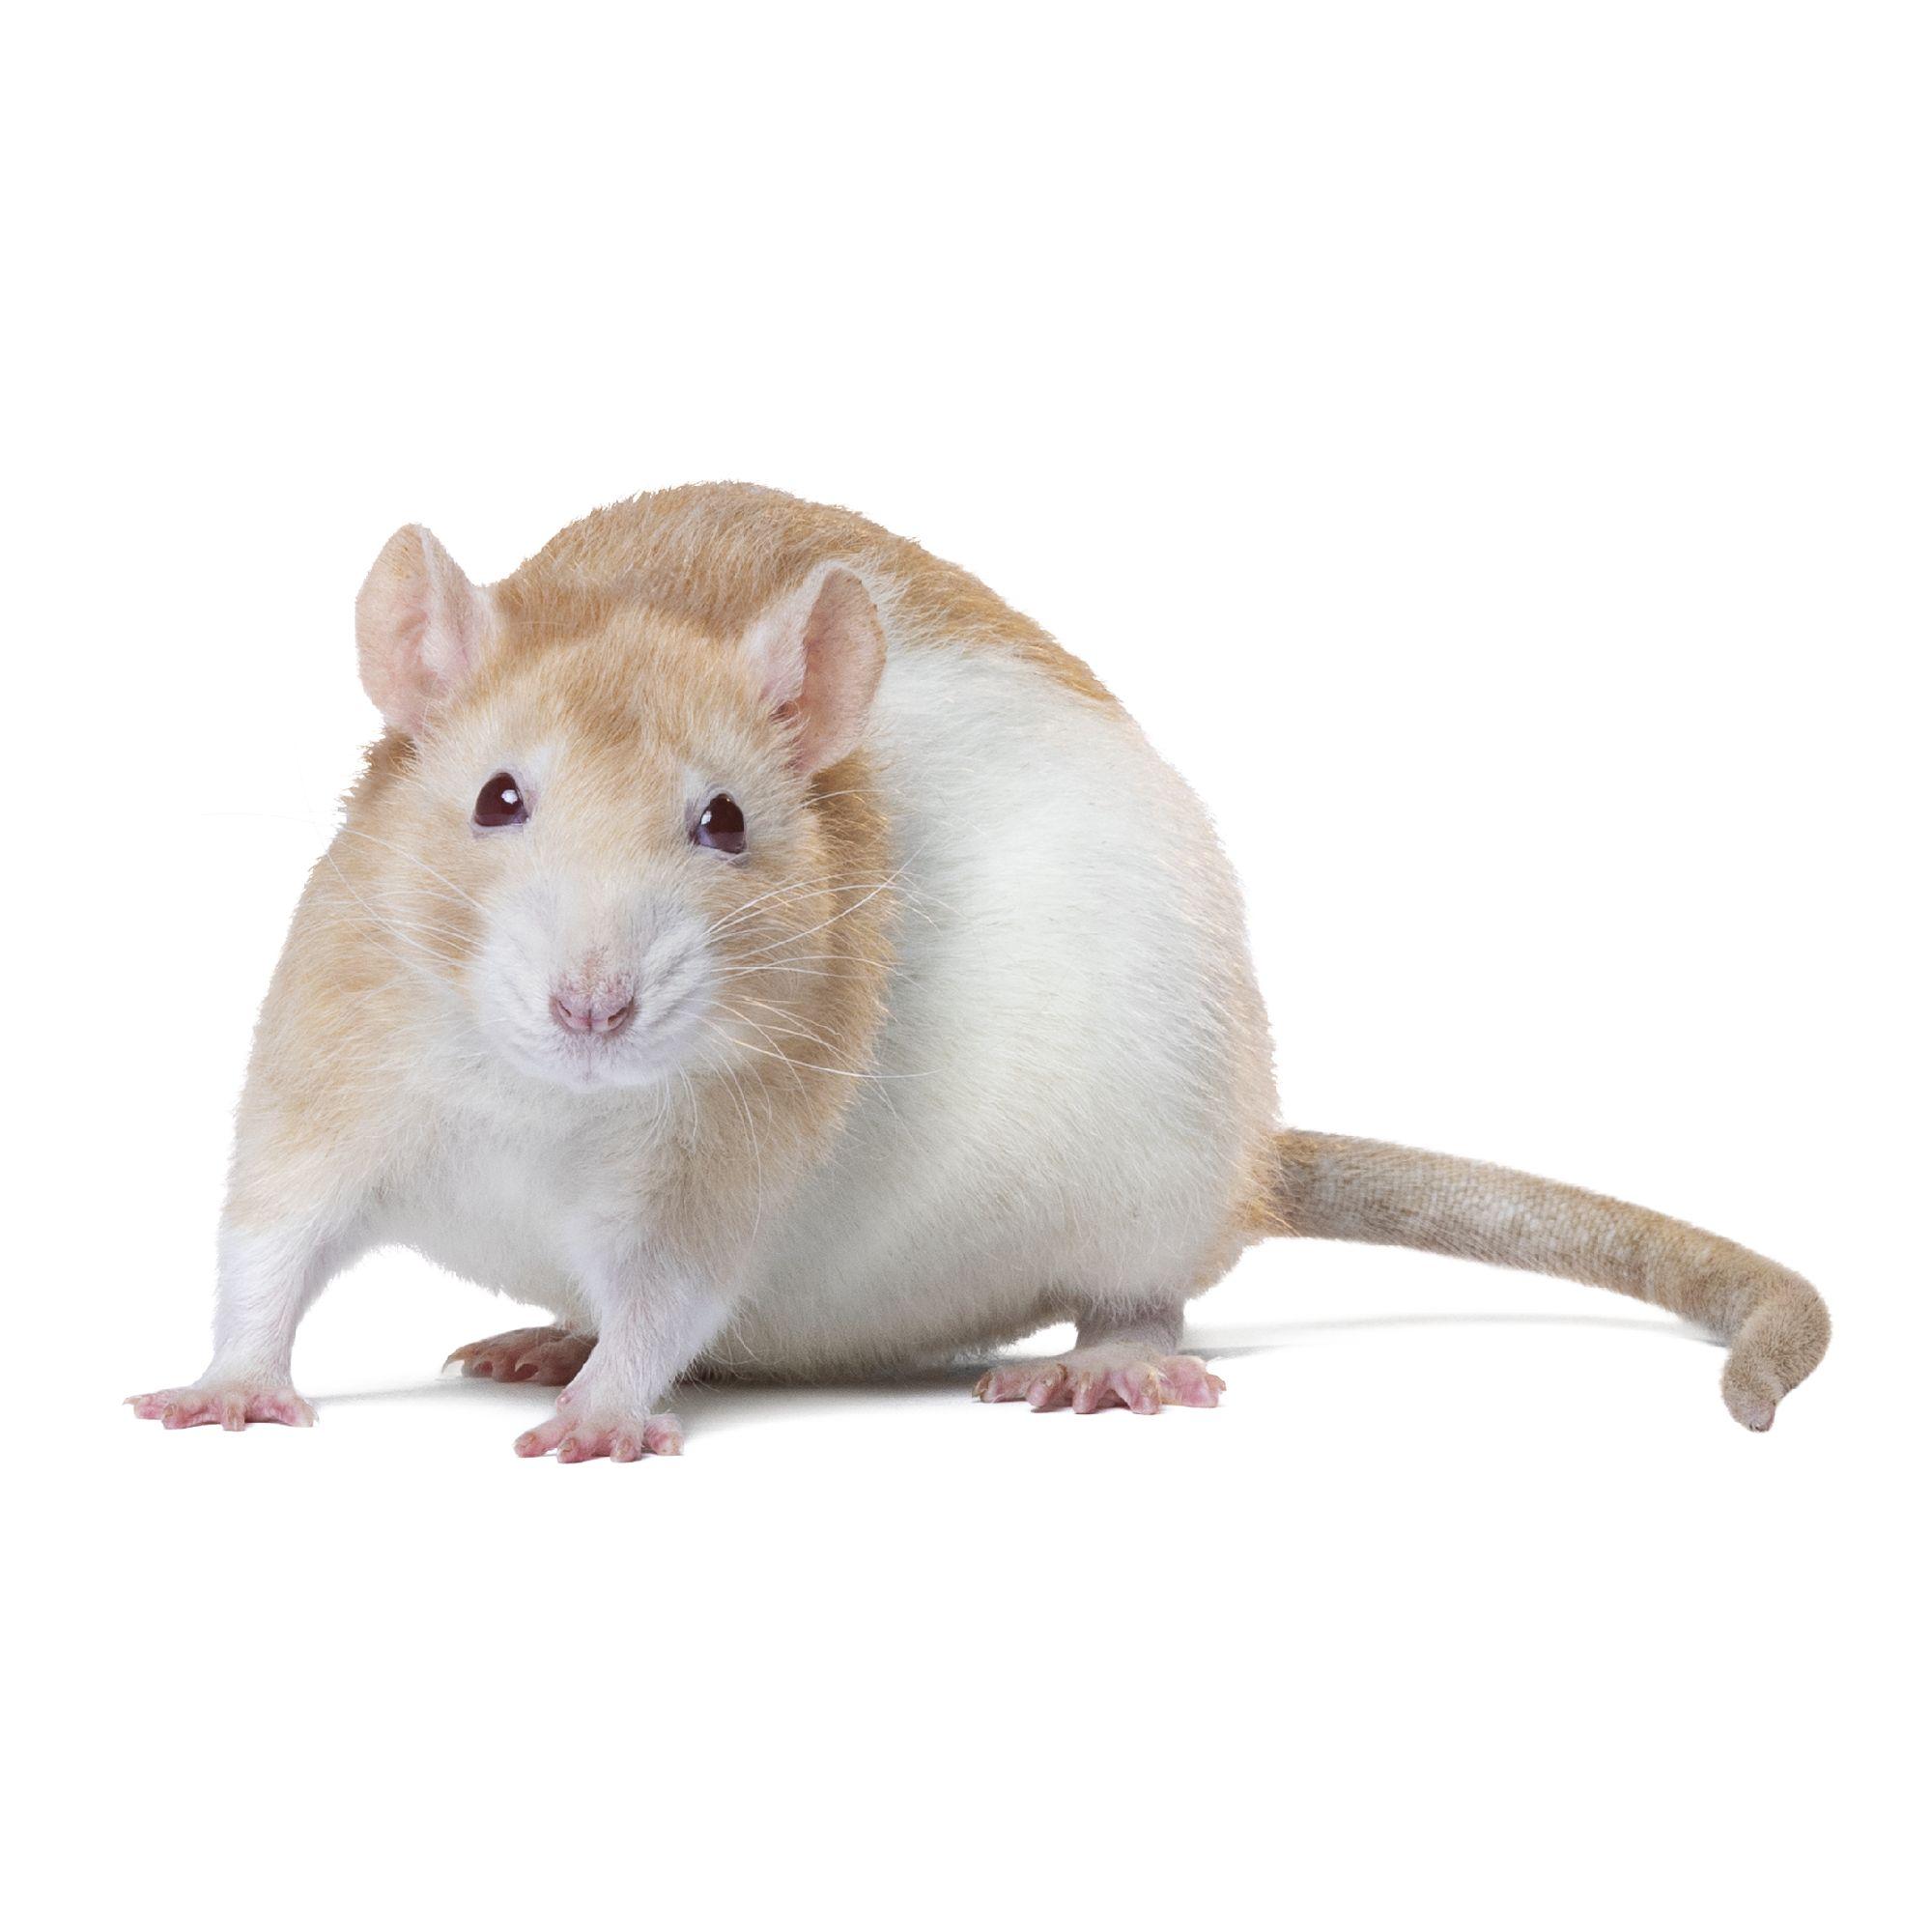 Fancy Rat Small Pet Hamsters Guinea Pigs More Petsmart